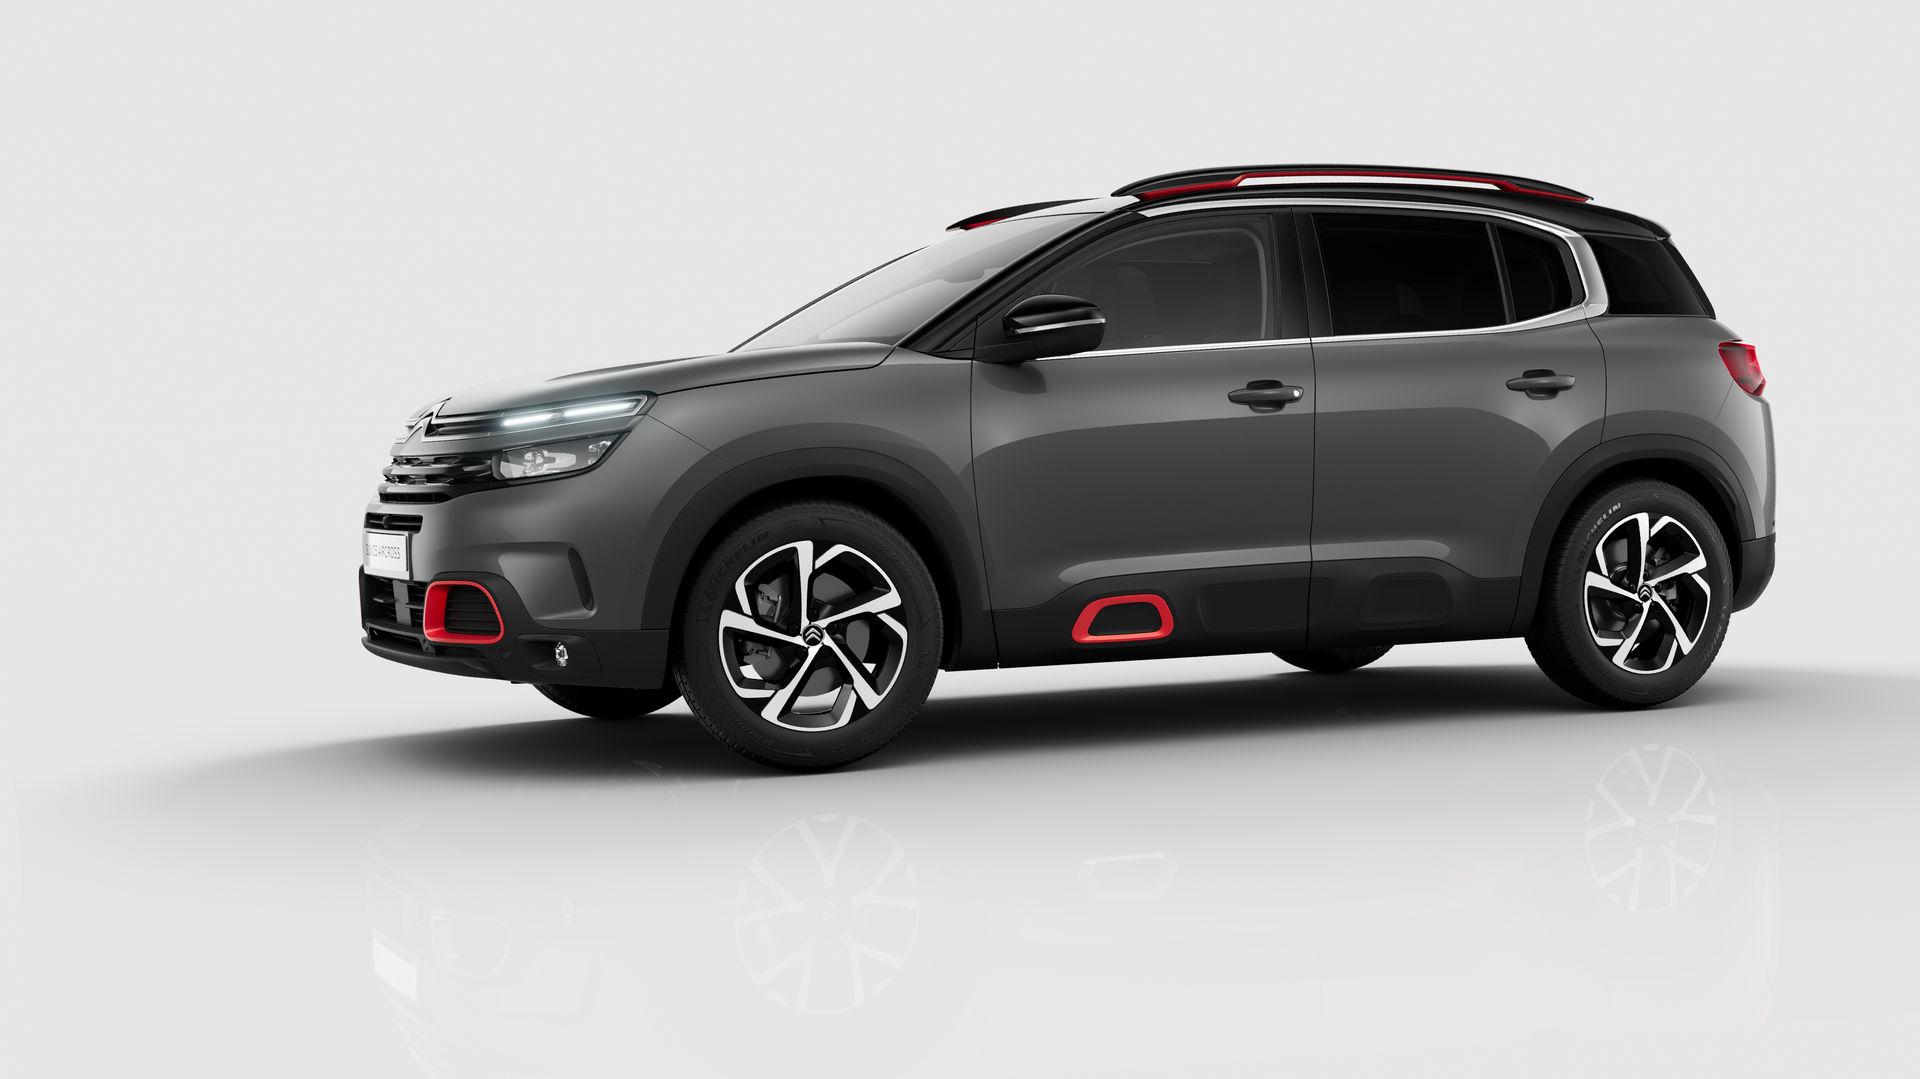 Sajam automobila - Auto Expo 2019